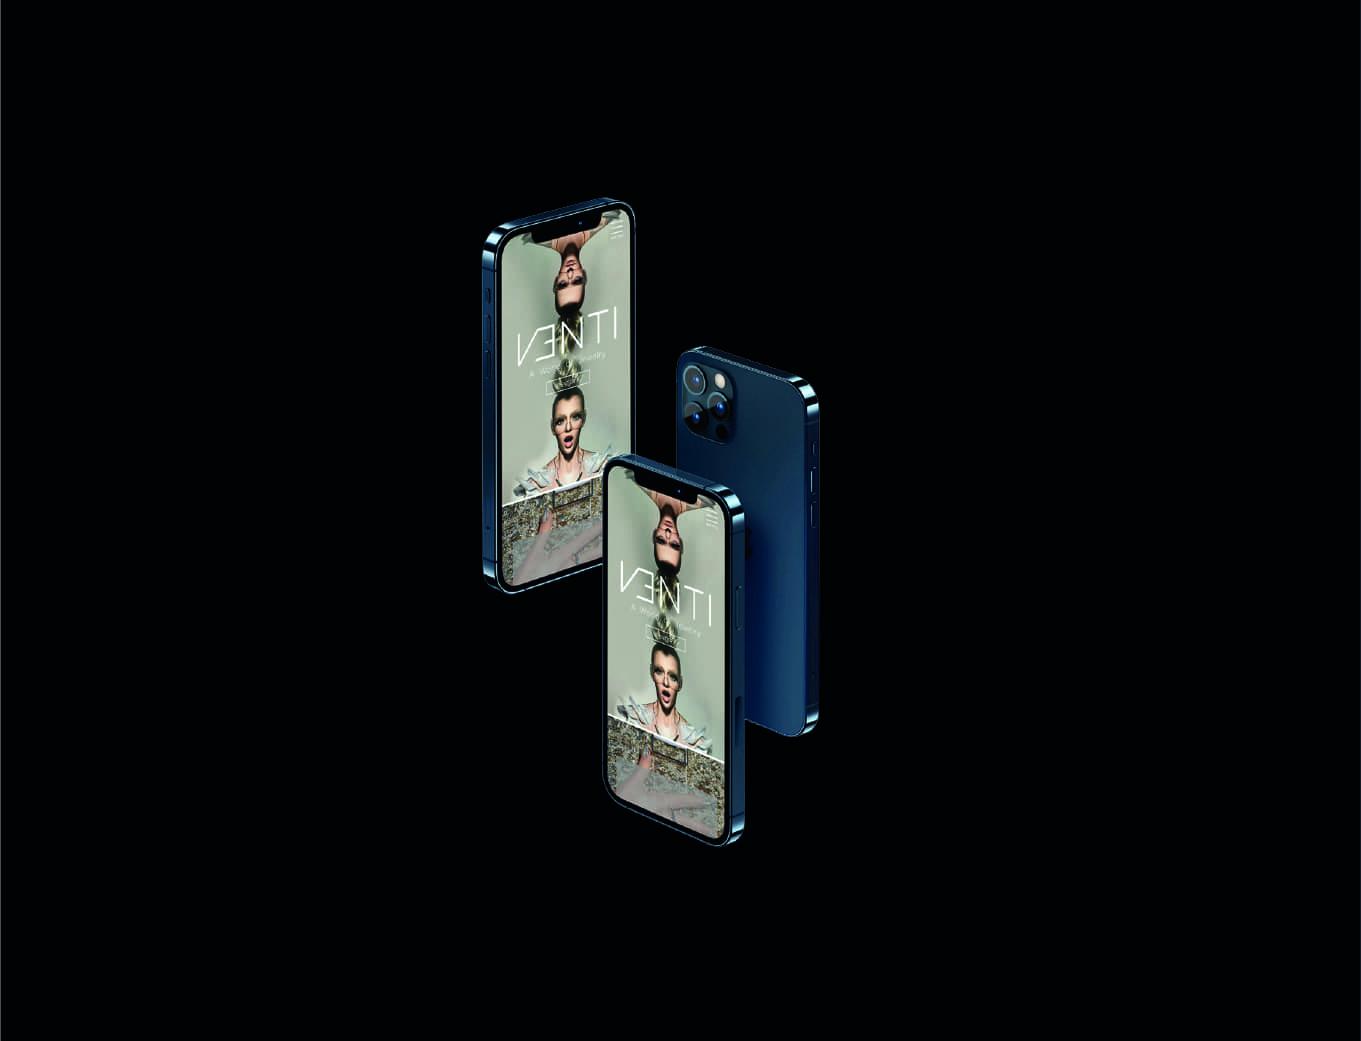 Venti premium women jewellery luxury brand mobile app activation mockup on iphone 12